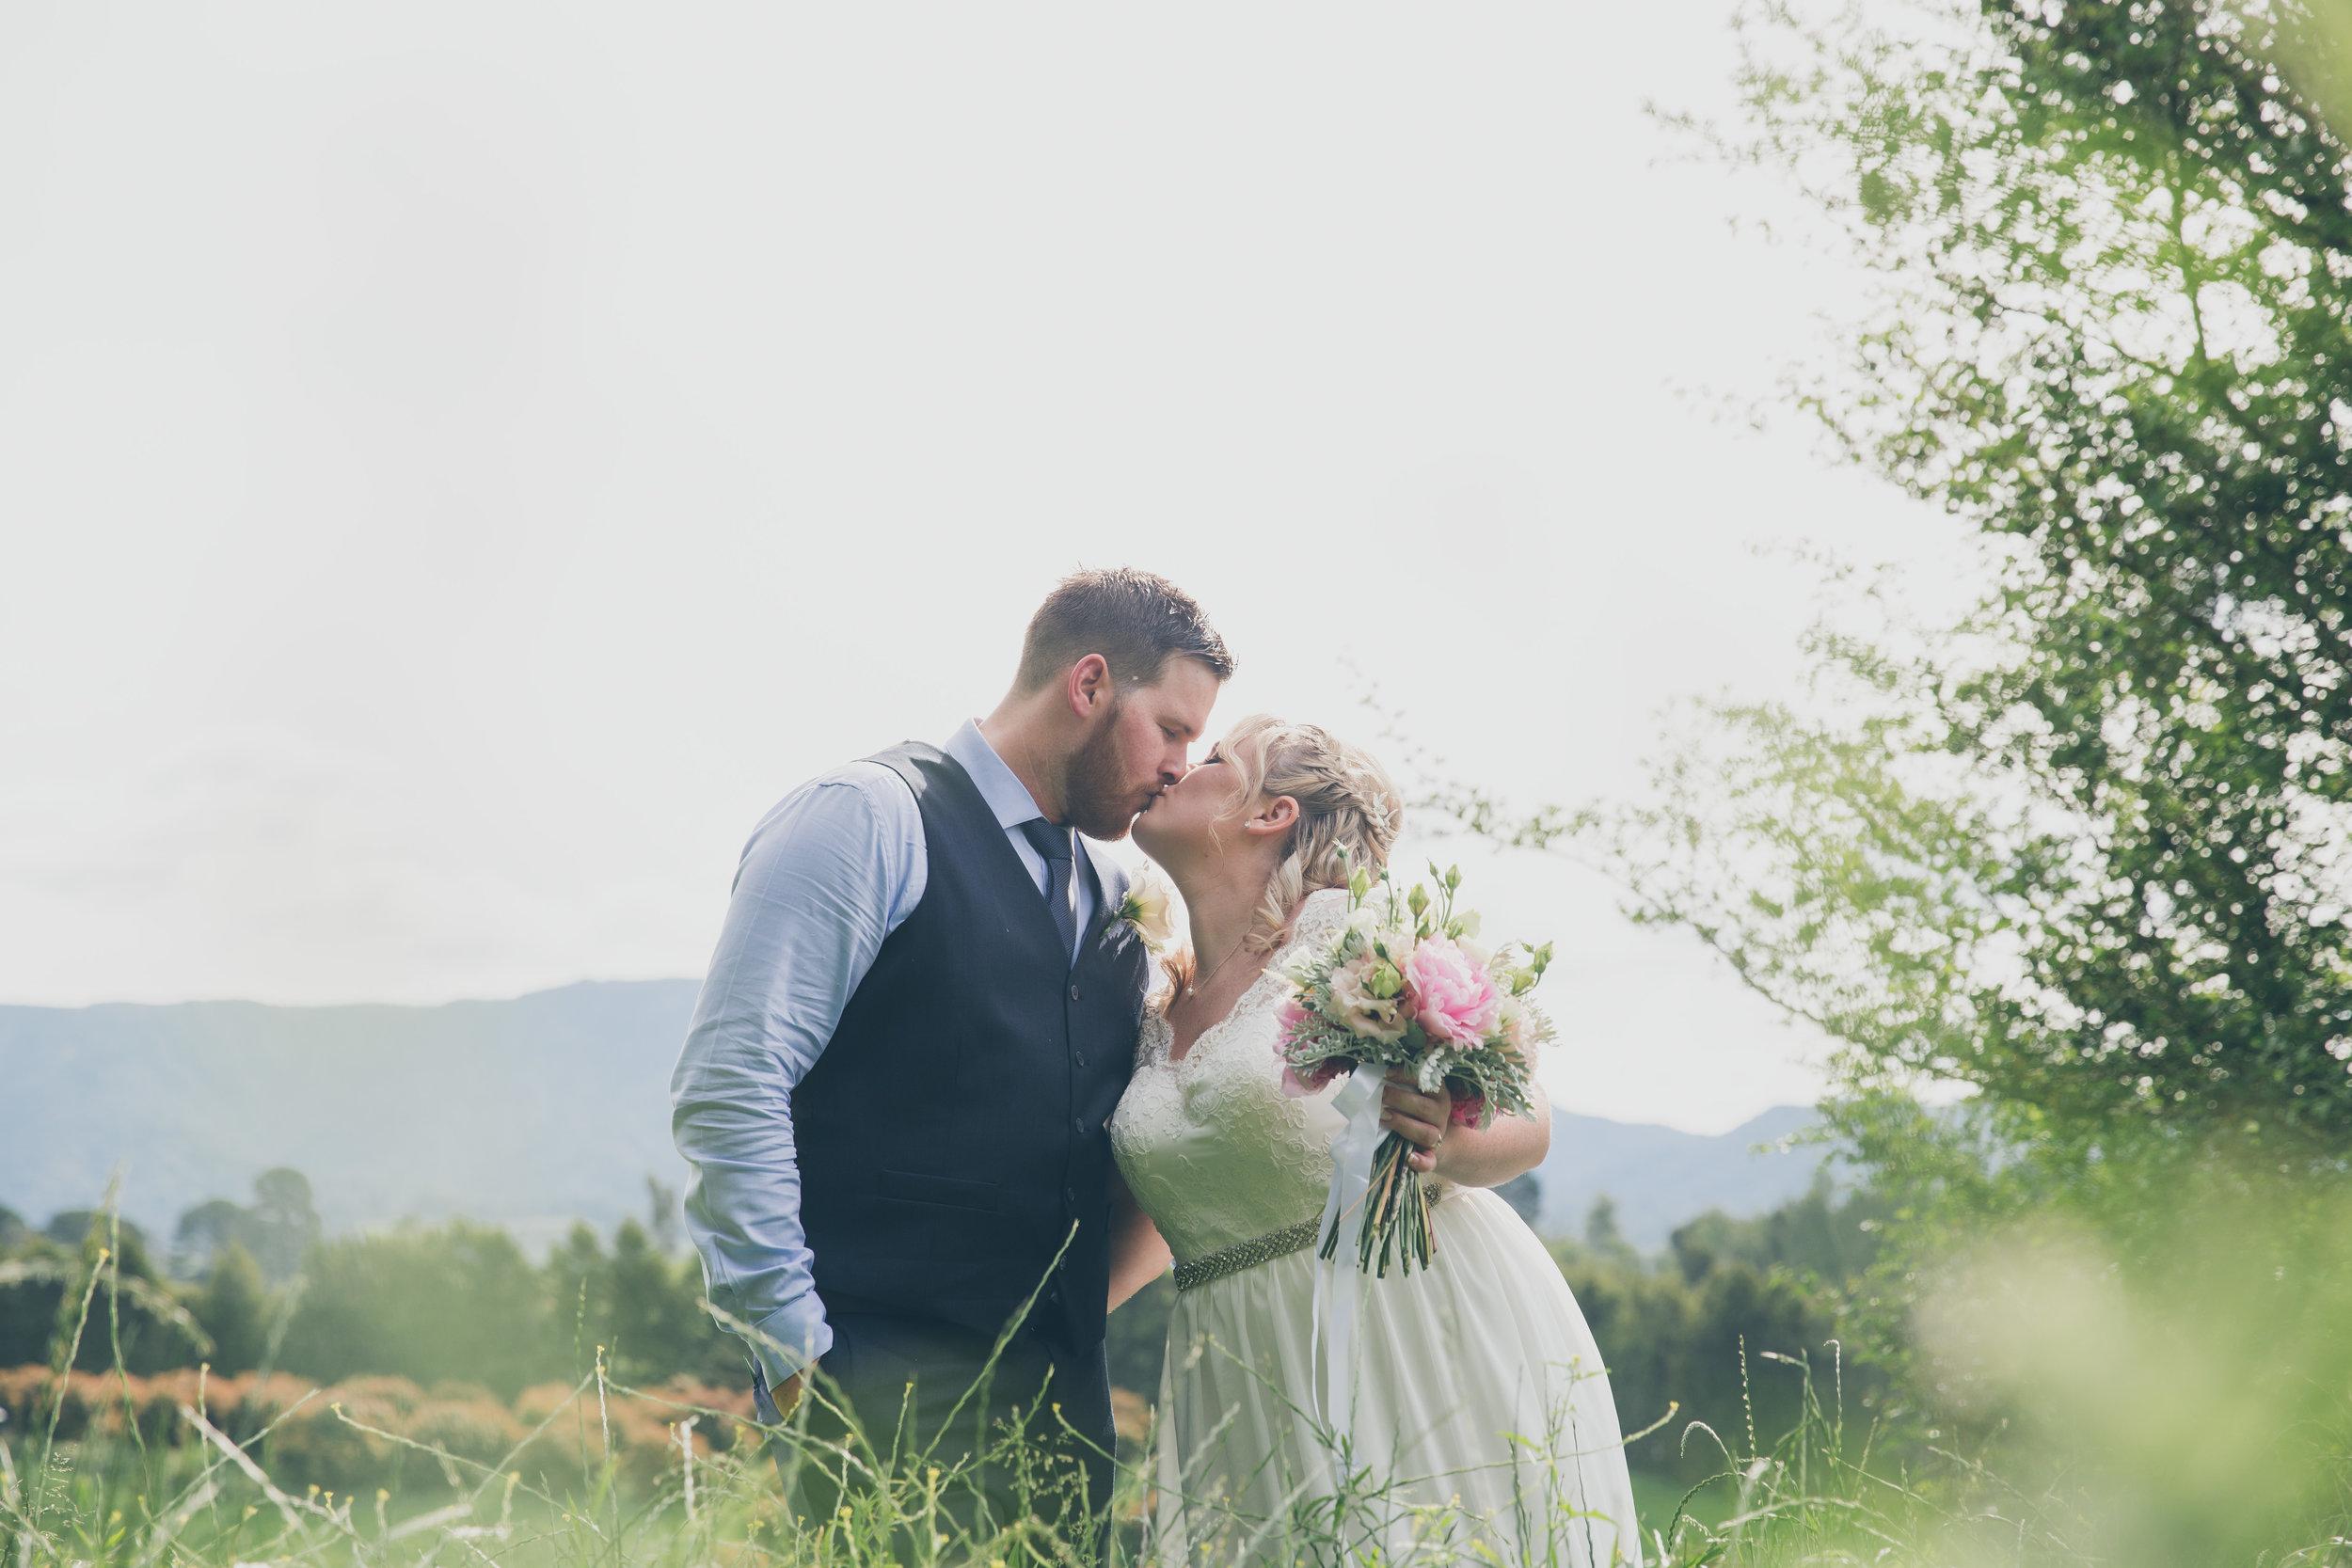 K & S - Wedding - Oh Joy! Photography - Tauranga, New Zealand-4.jpg